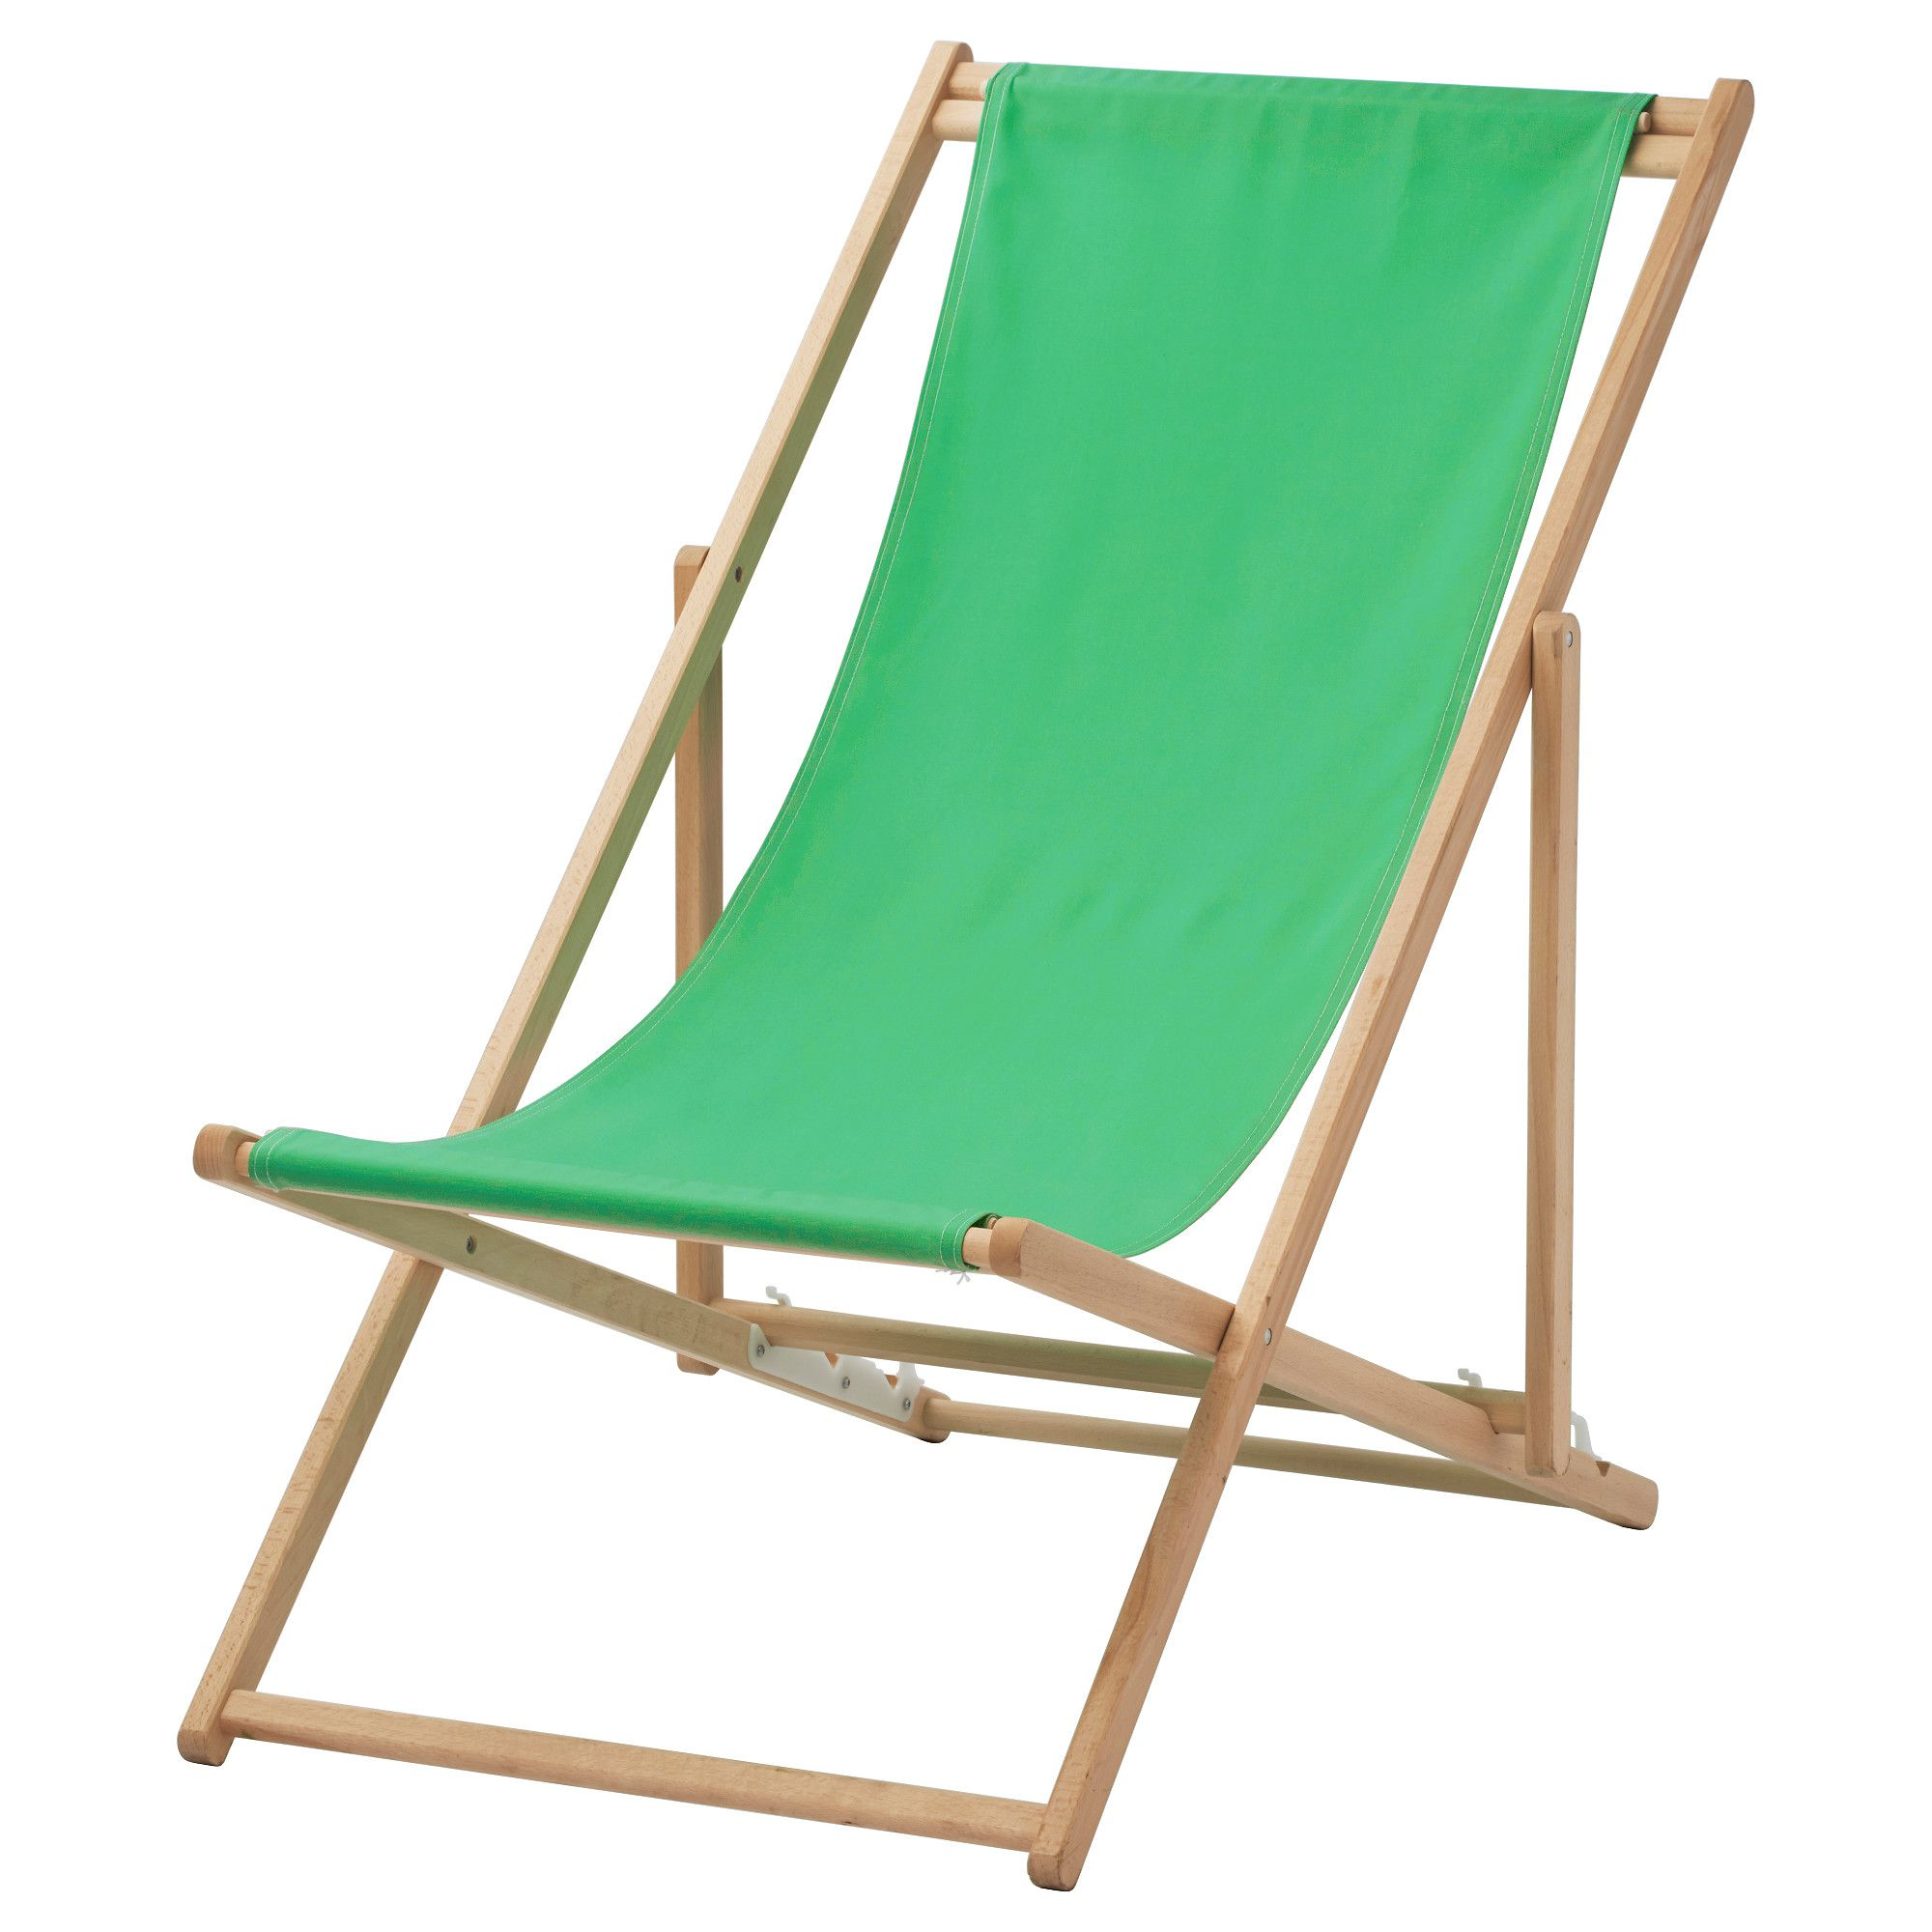 MYSINGSÖ Beach chair - folding green - - IKEA  sc 1 st  Pinterest & MYSINGSÖ Beach chair - folding green - - IKEA | Jardincito ...